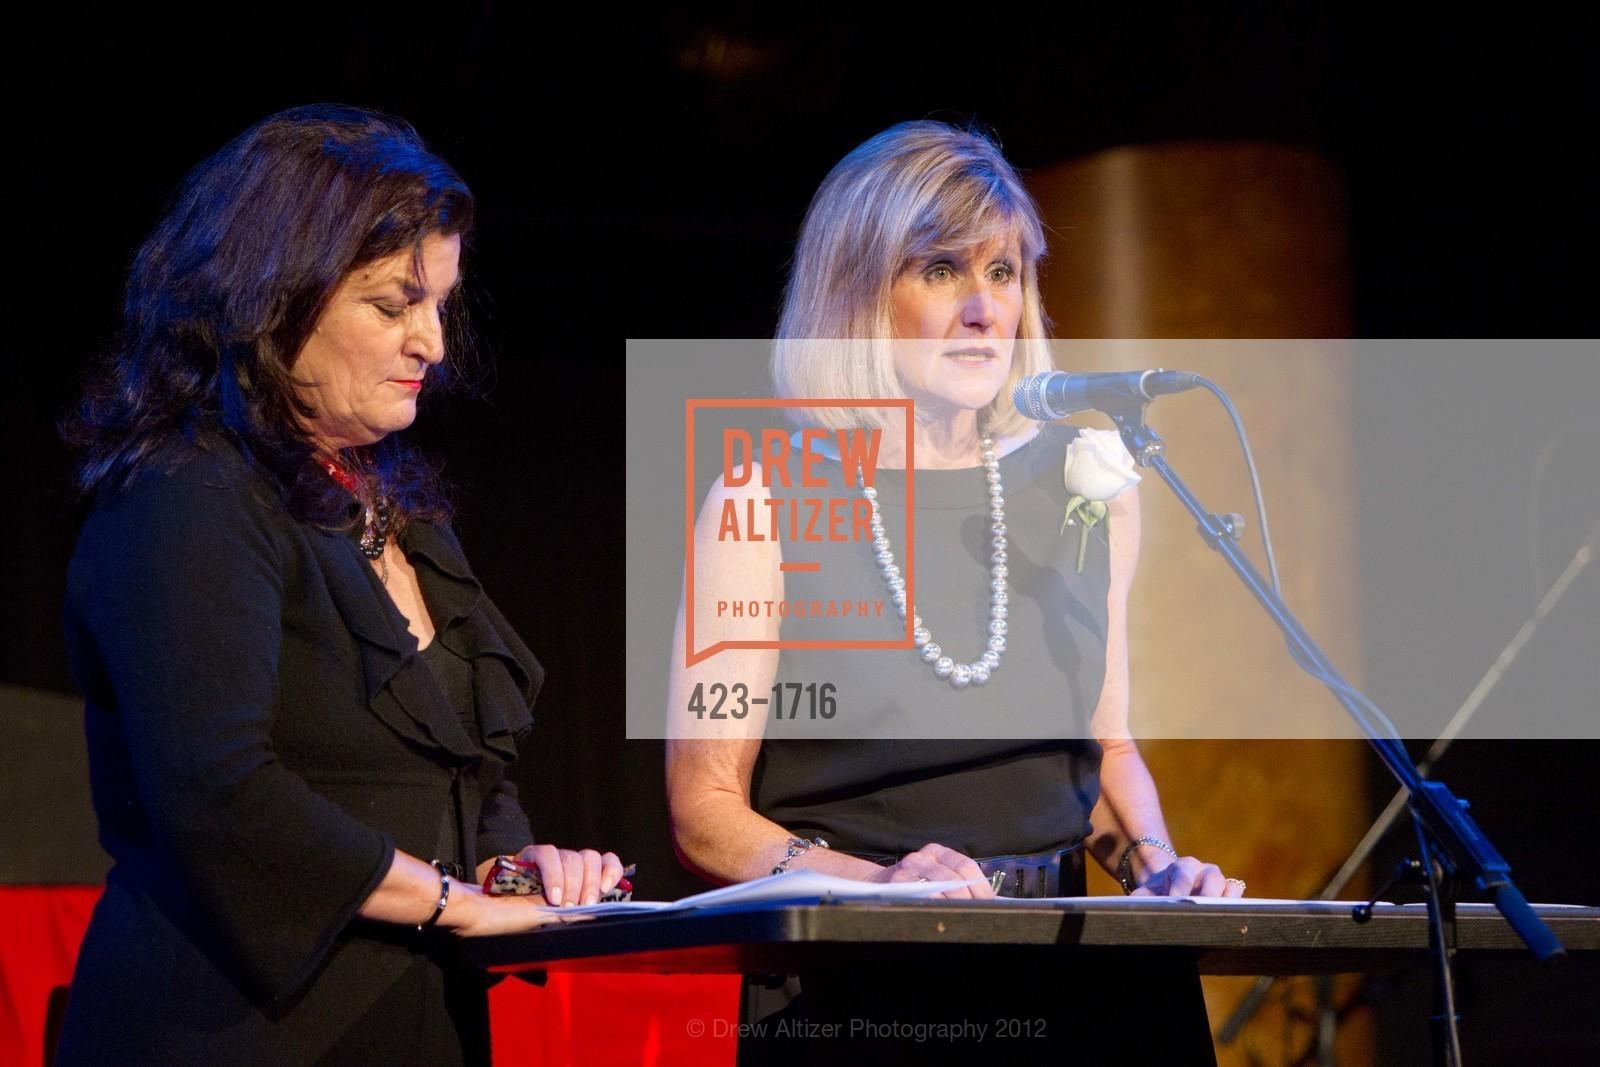 Sheila Kelly, Marion McGovern, Photo #423-1716